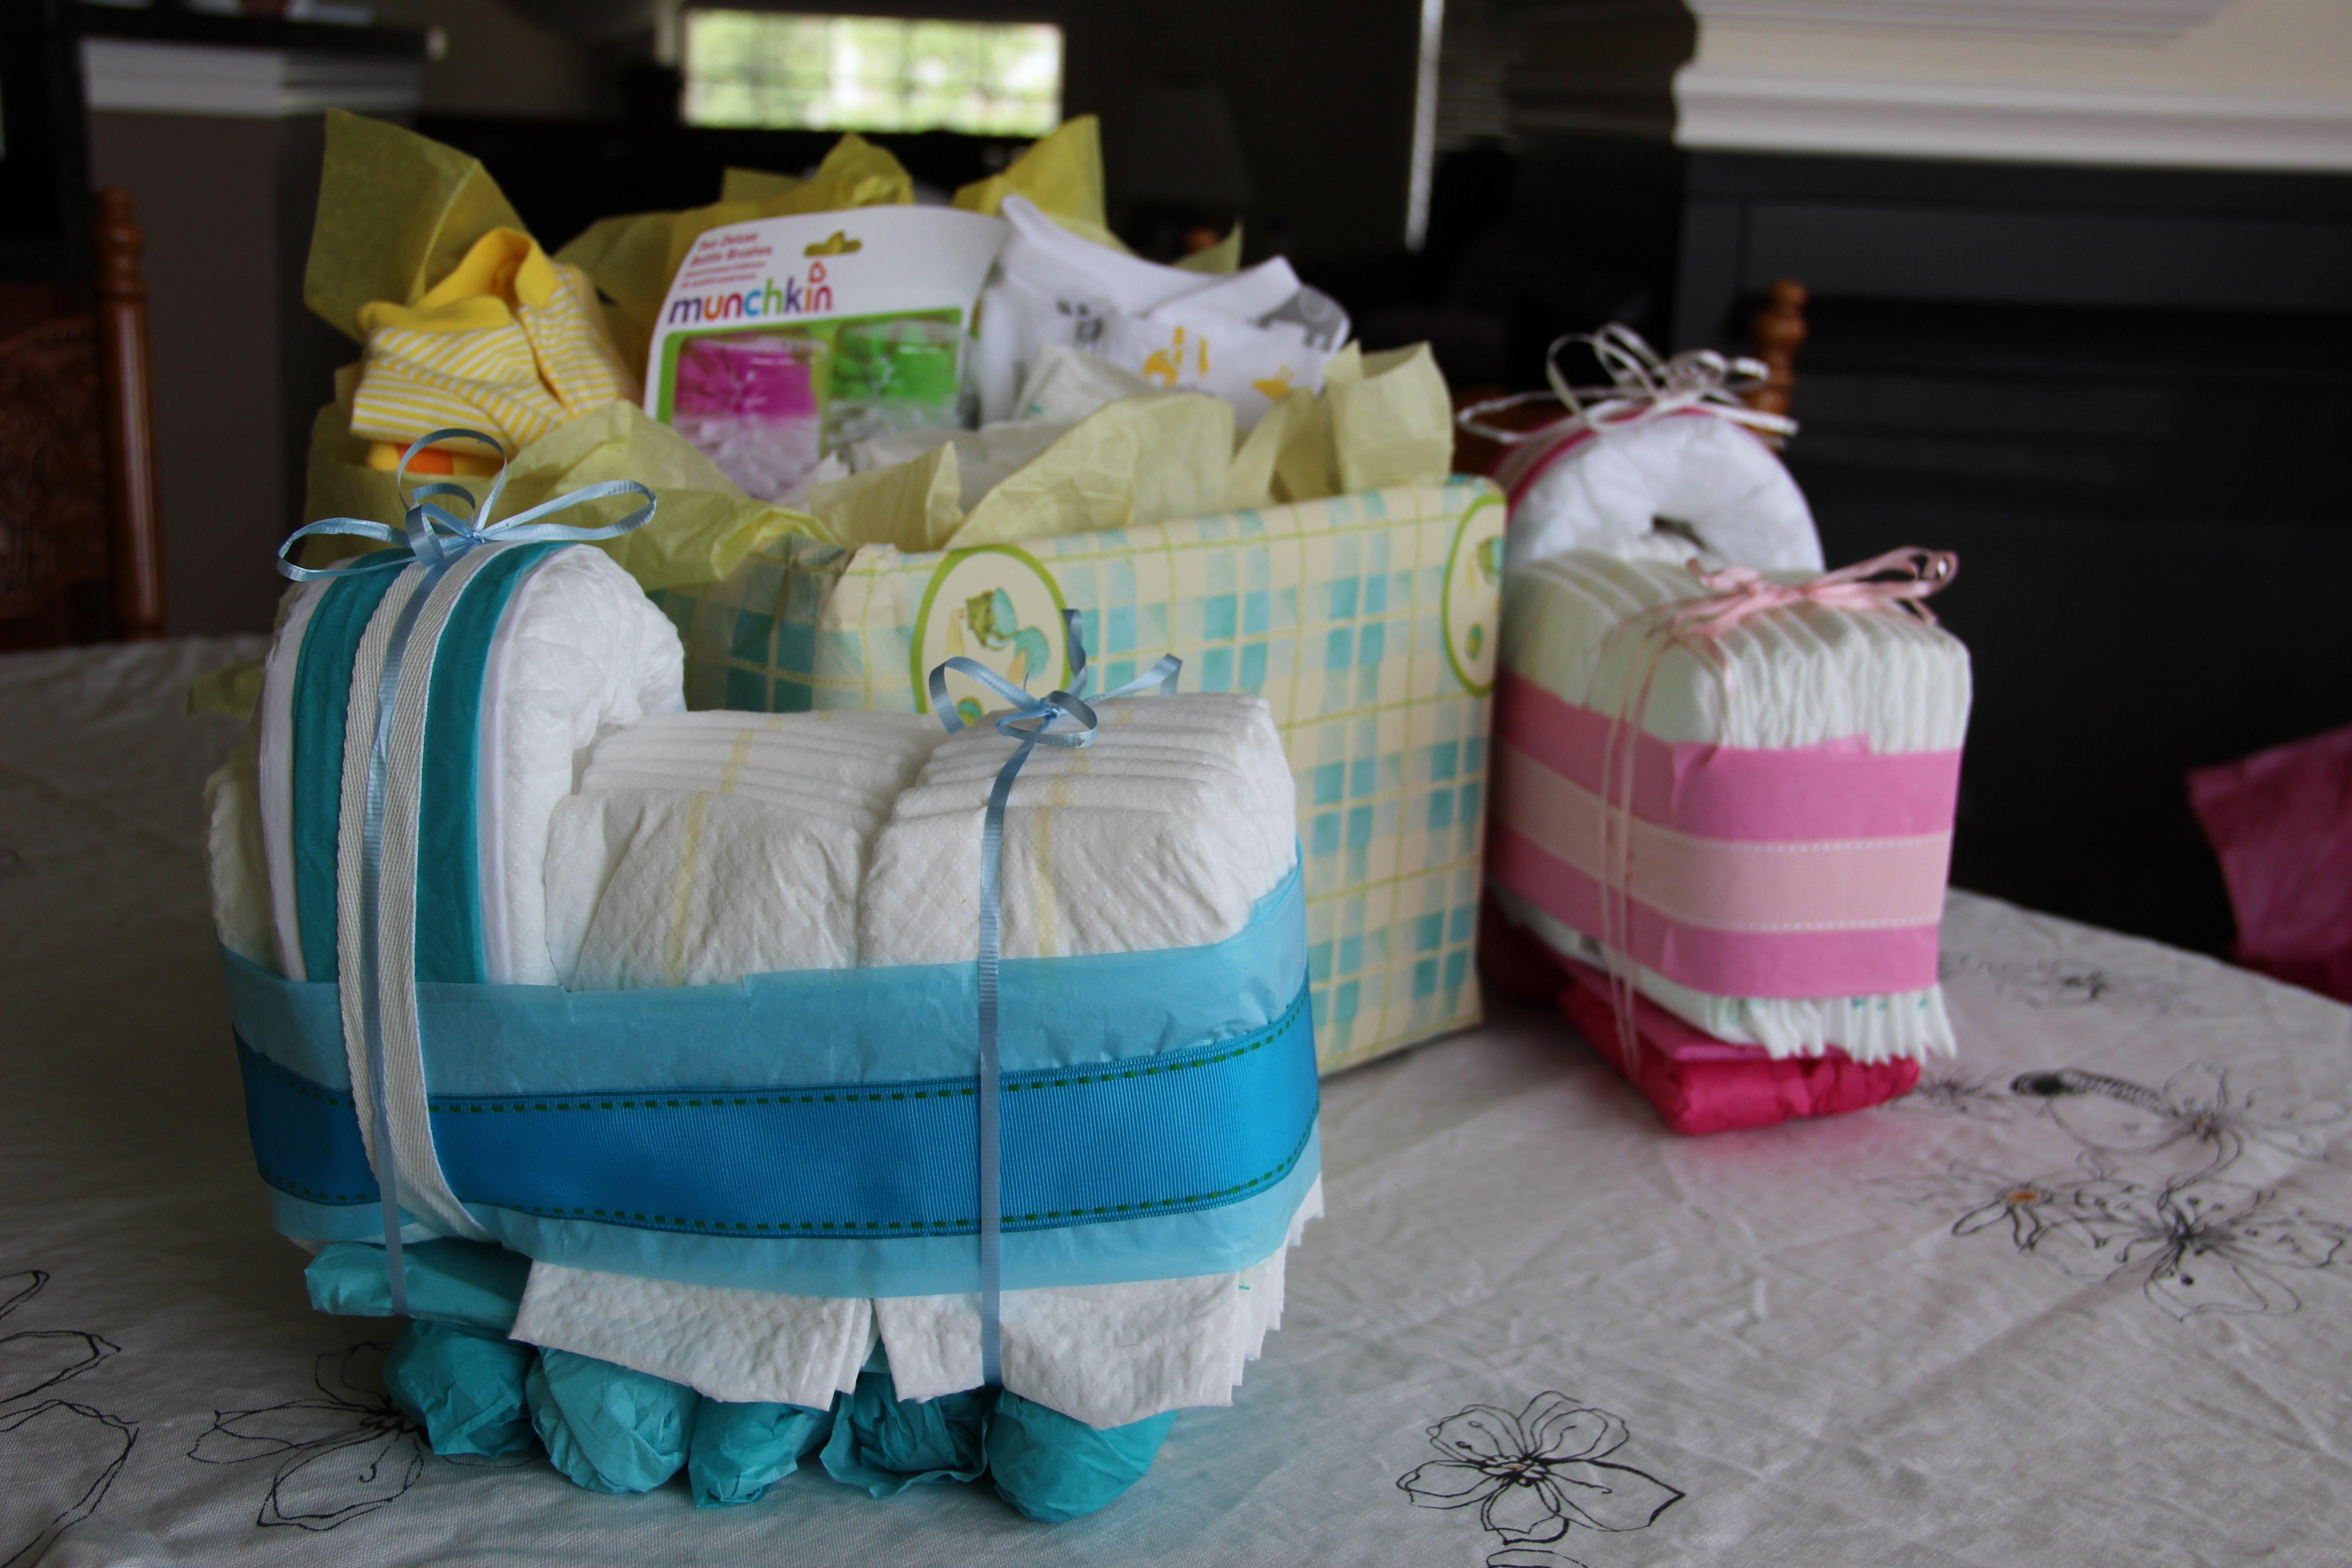 10 Beautiful Boy Baby Shower Gift Ideas pinterest baby shower gift ideas omega center ideas for baby 4 2020